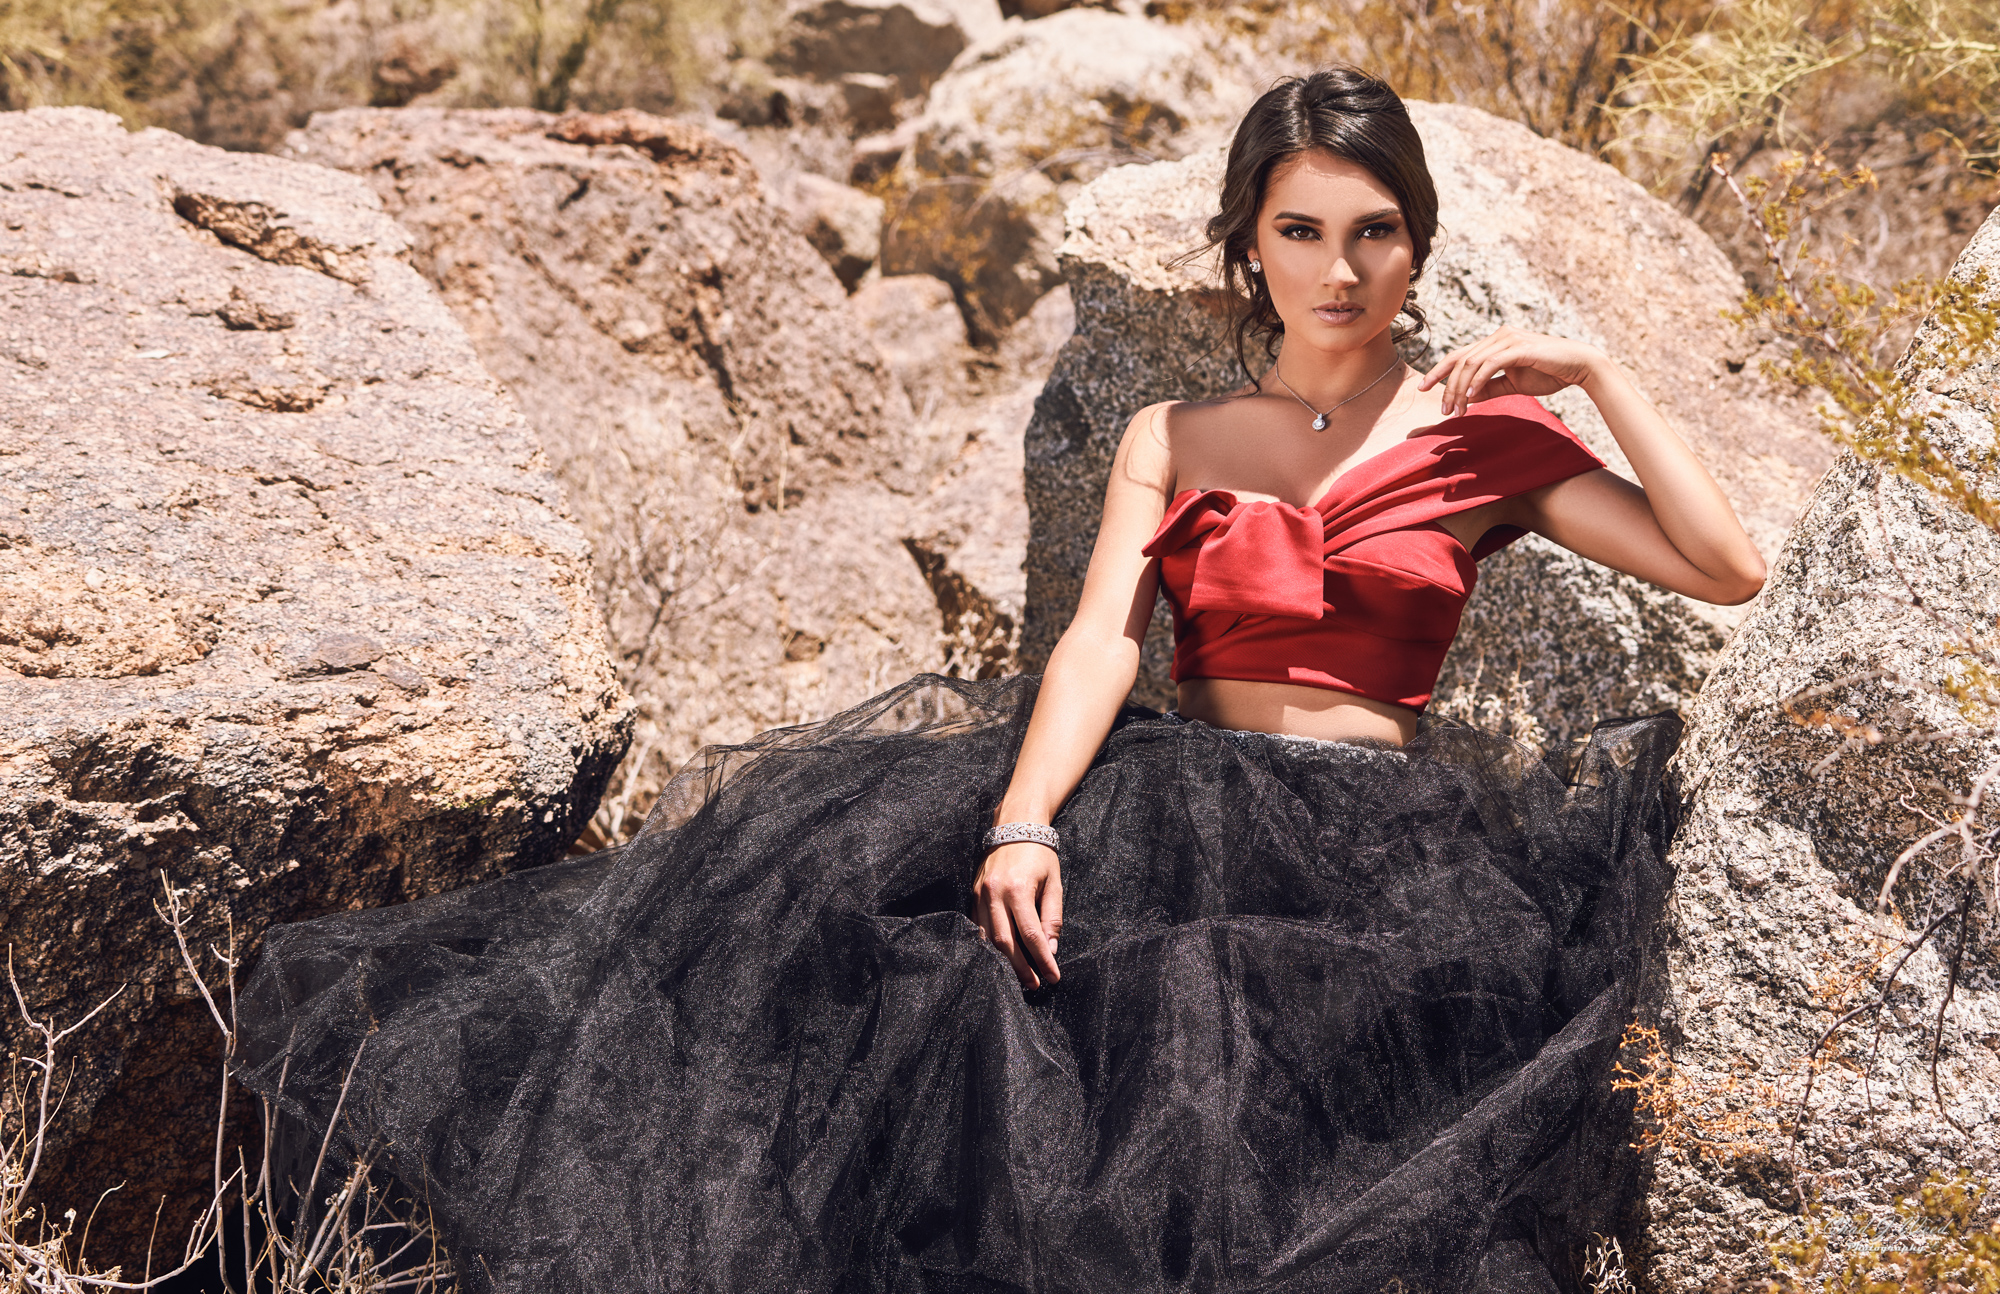 Model Zari by Mesa Arizona Model Photographer Chad Weed